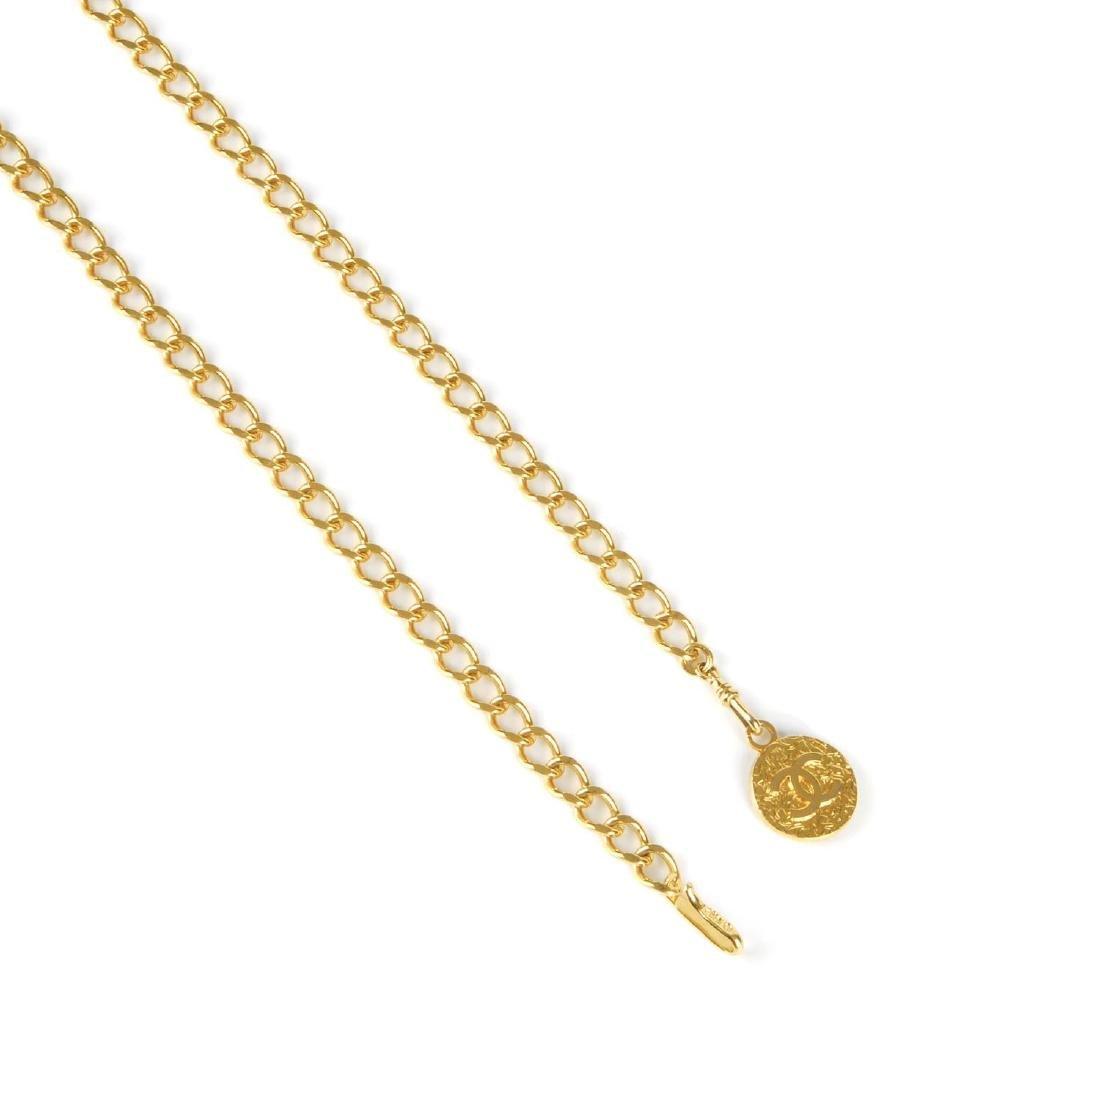 CHANEL - a chain belt. Featuring a gold-tone curb chain